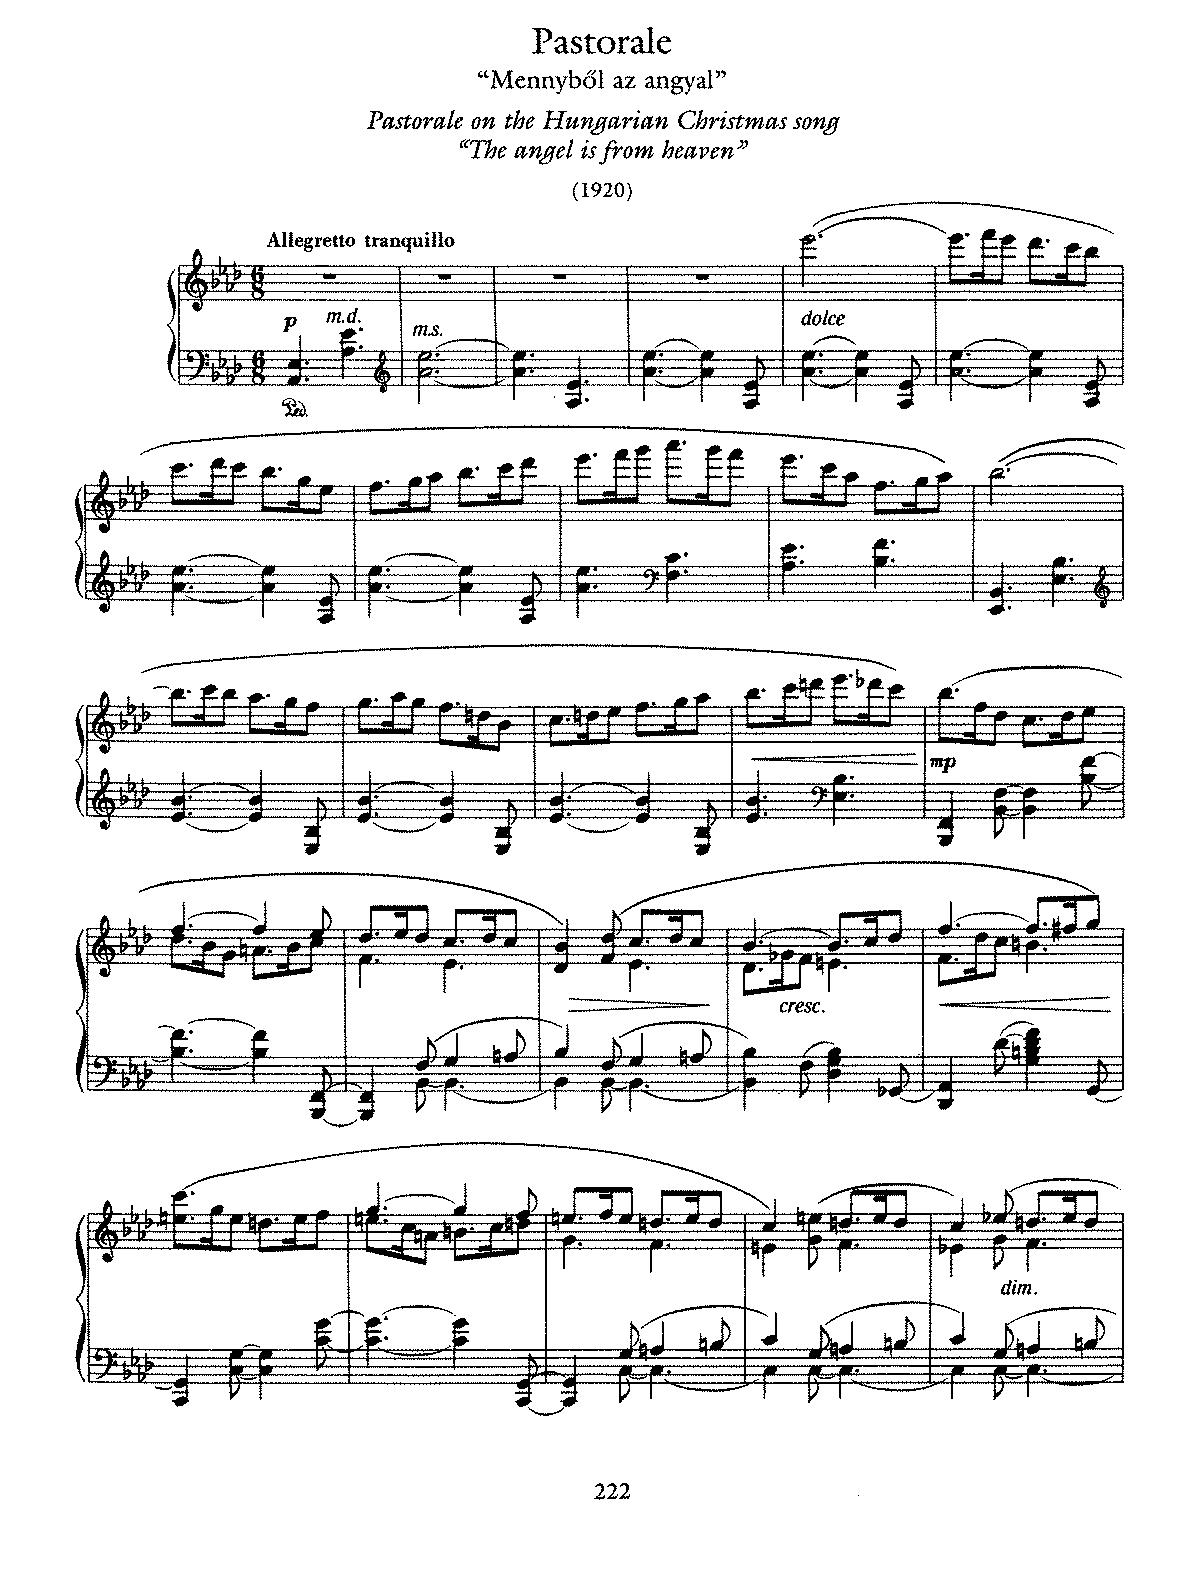 Pastorale on a Hungarian Christmas Song (Dohnányi, Ernő) - IMSLP: Free Sheet Music PDF Download